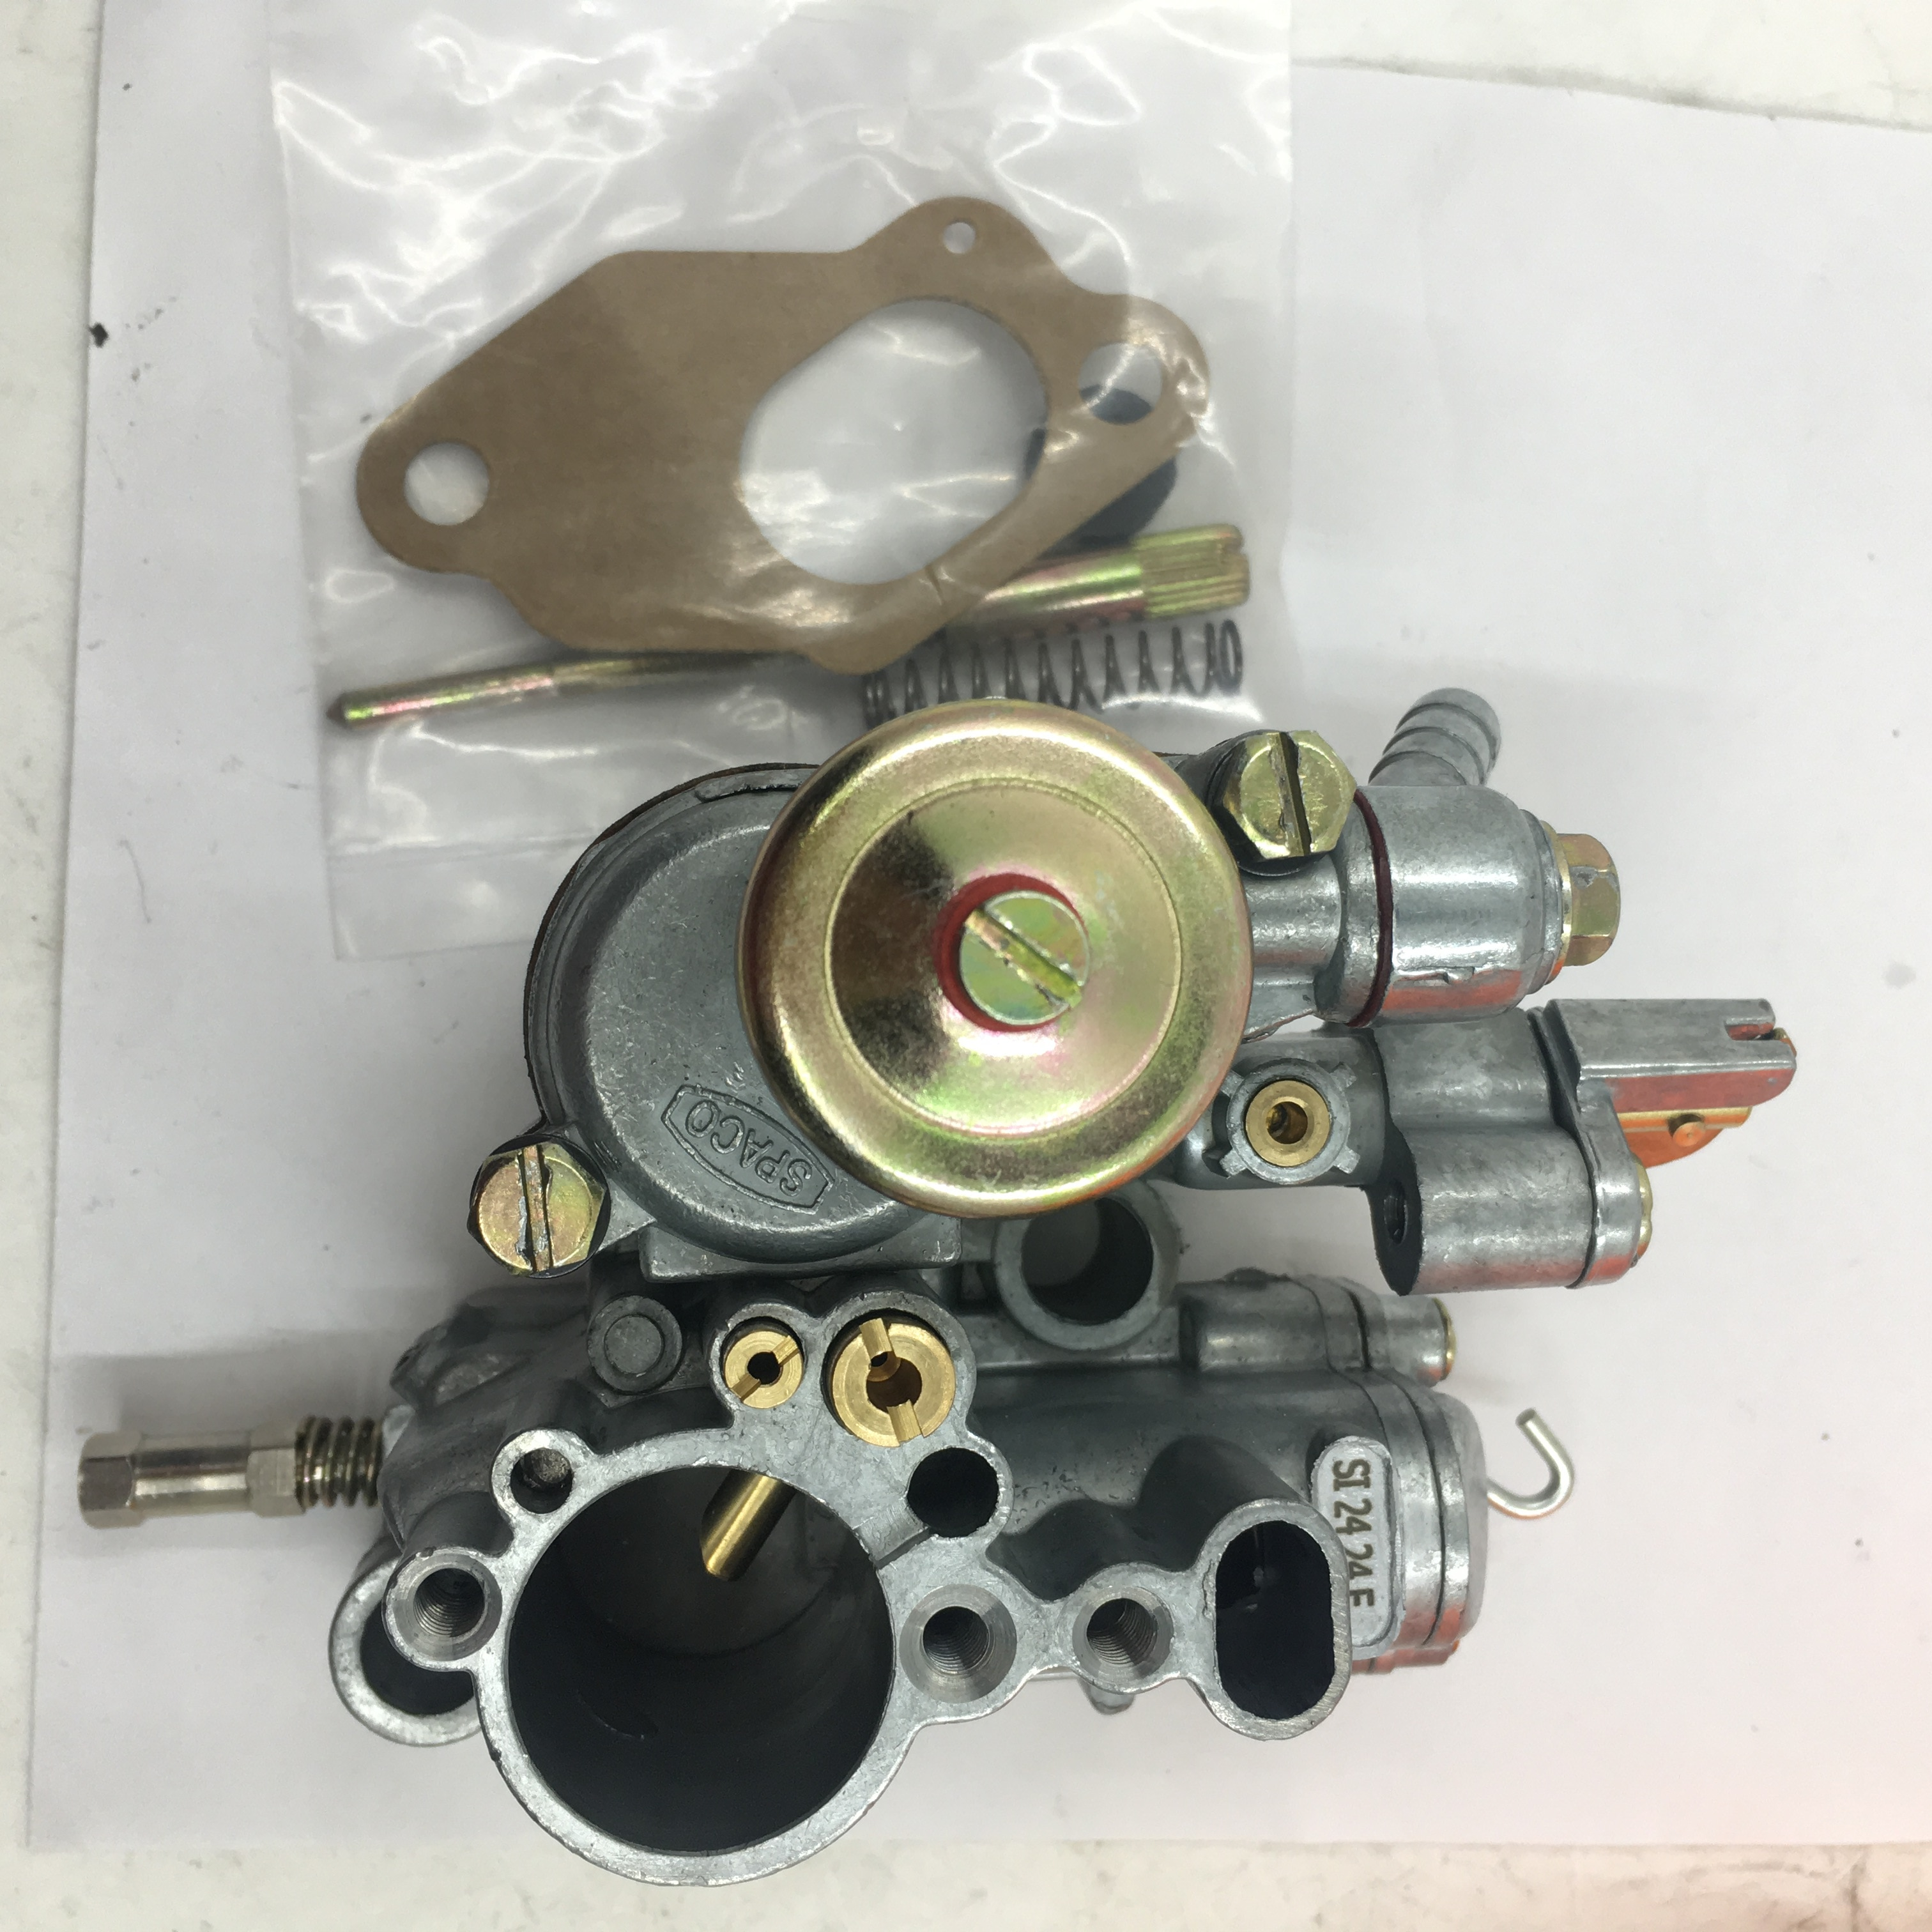 24 100cc 125cc 150cc dellorto modelo spaco 24 mm vba vbb sb novo carburador carby ajuste de sherryberg para vespa